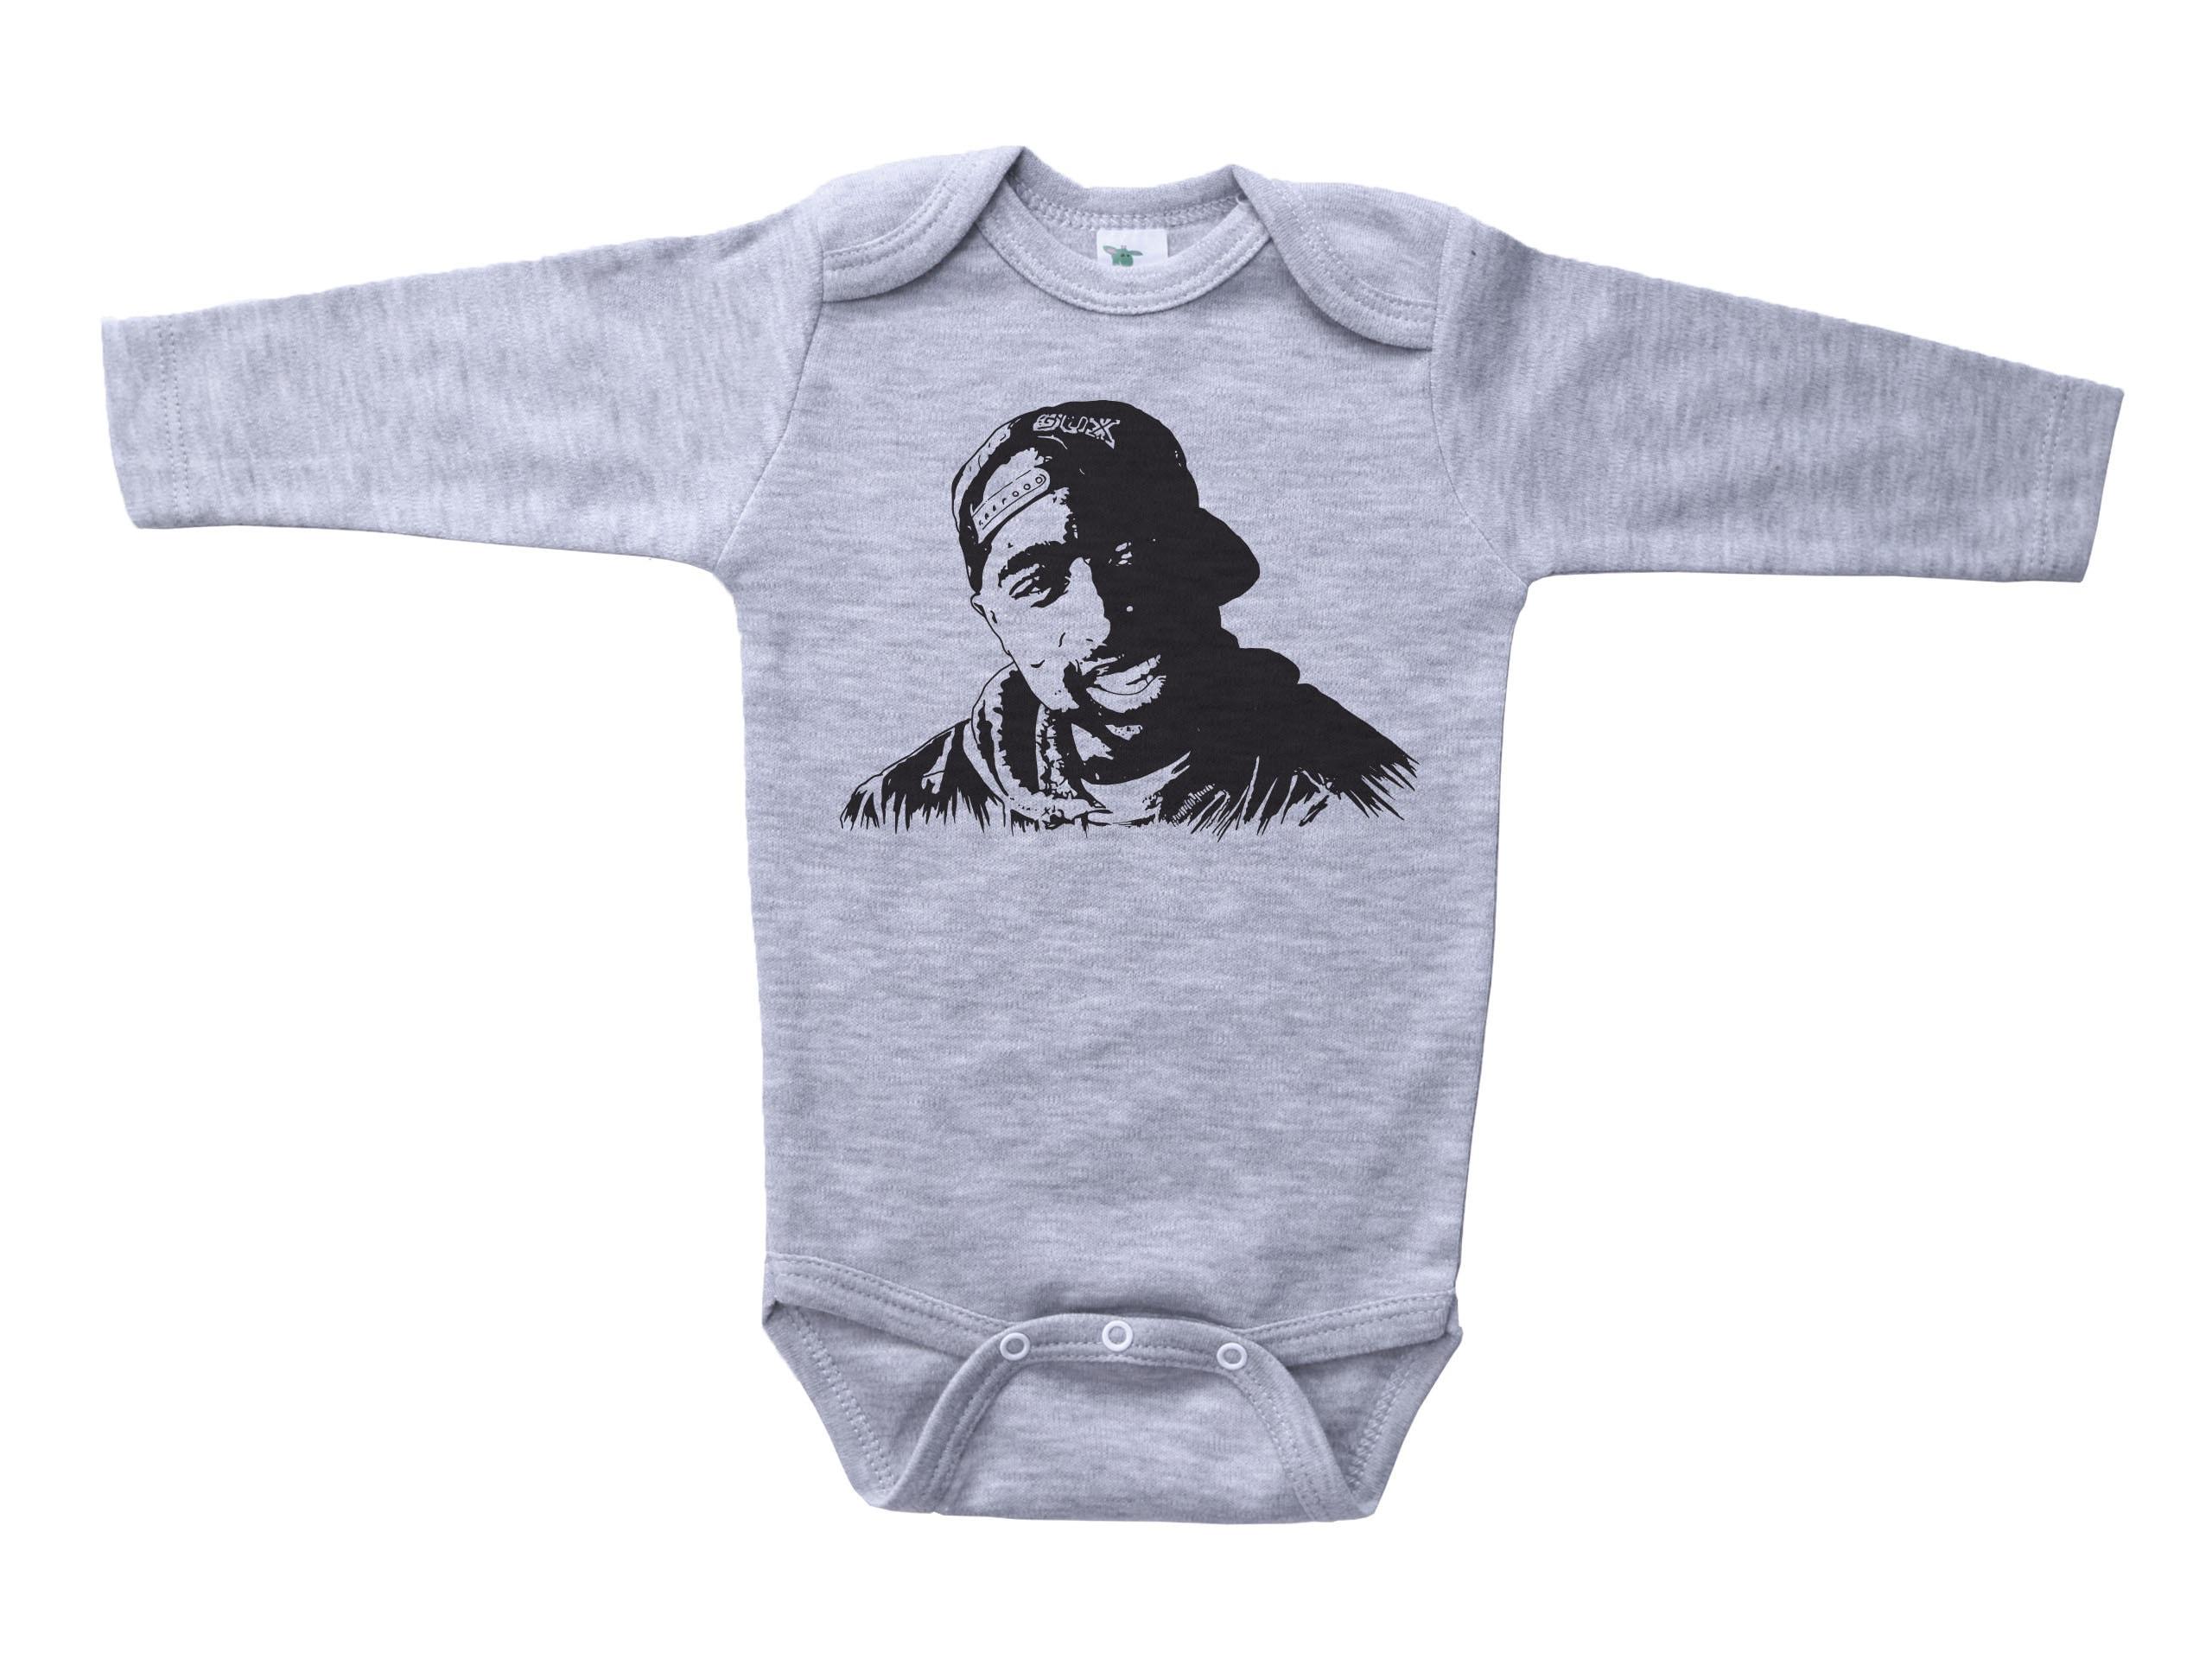 White Bodysuit Romper Jumpsuit TUPAC - Get Baffle Newborn Infant Baby